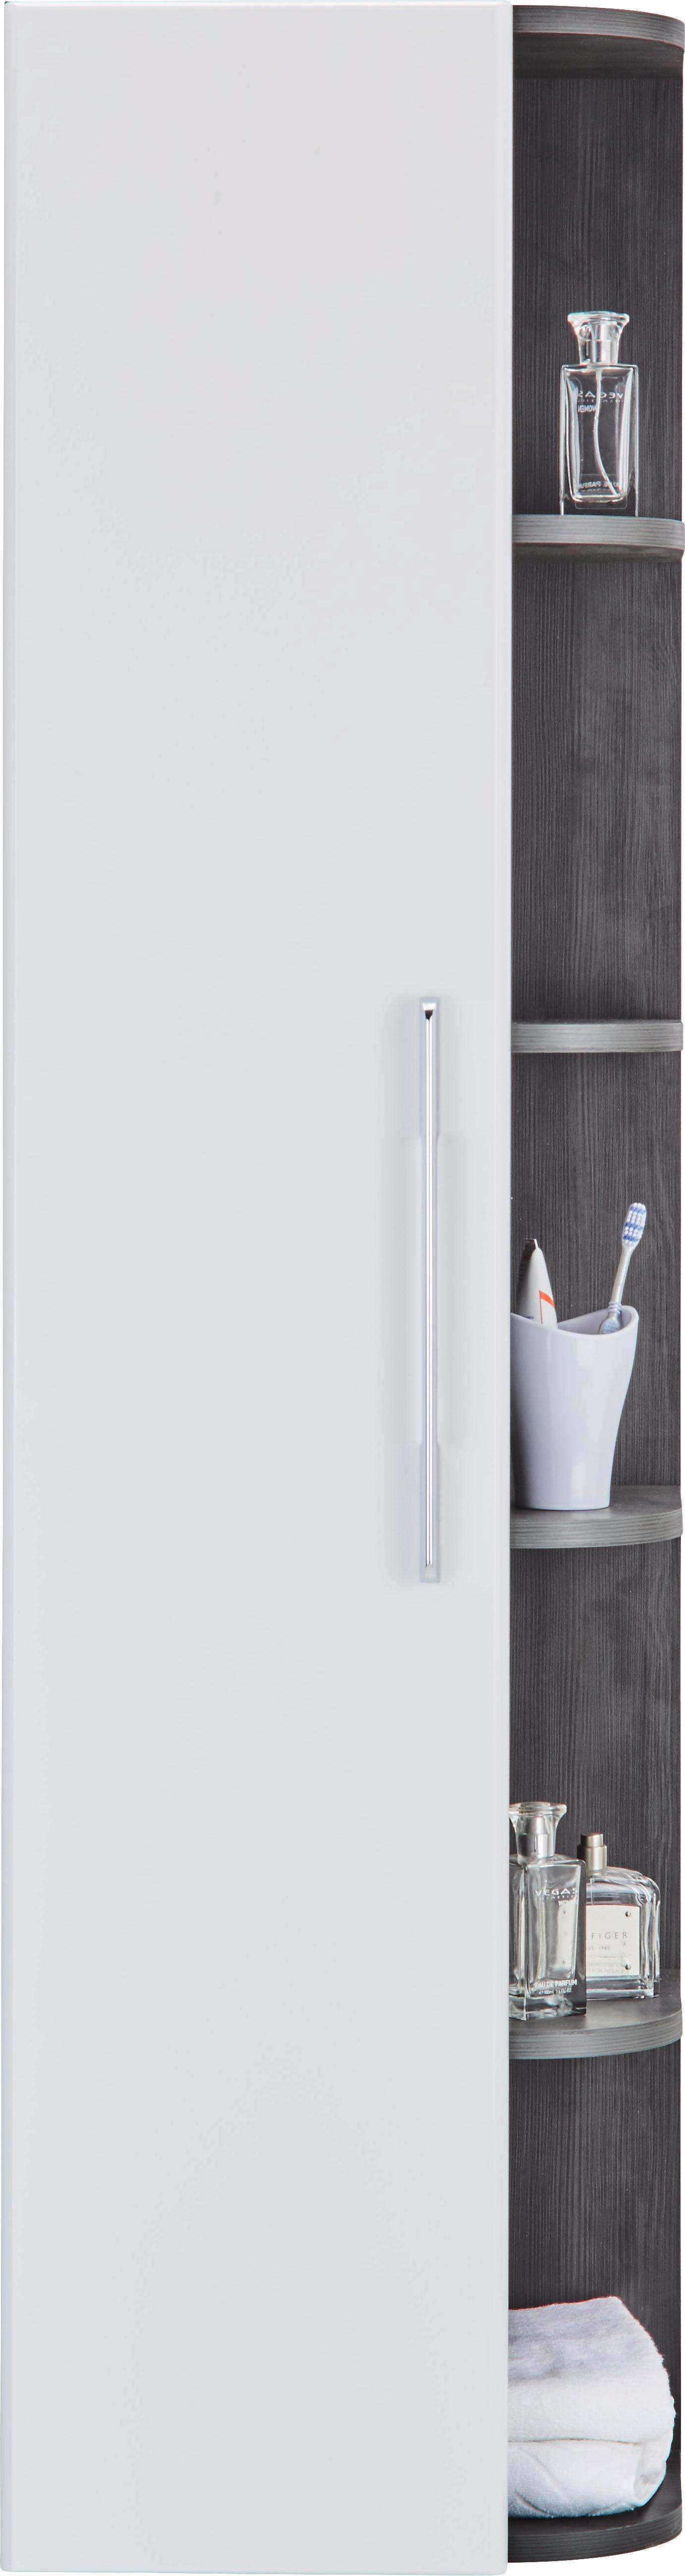 Badezimmerregal Weiss Dunkelgrau Online Kaufen Momax